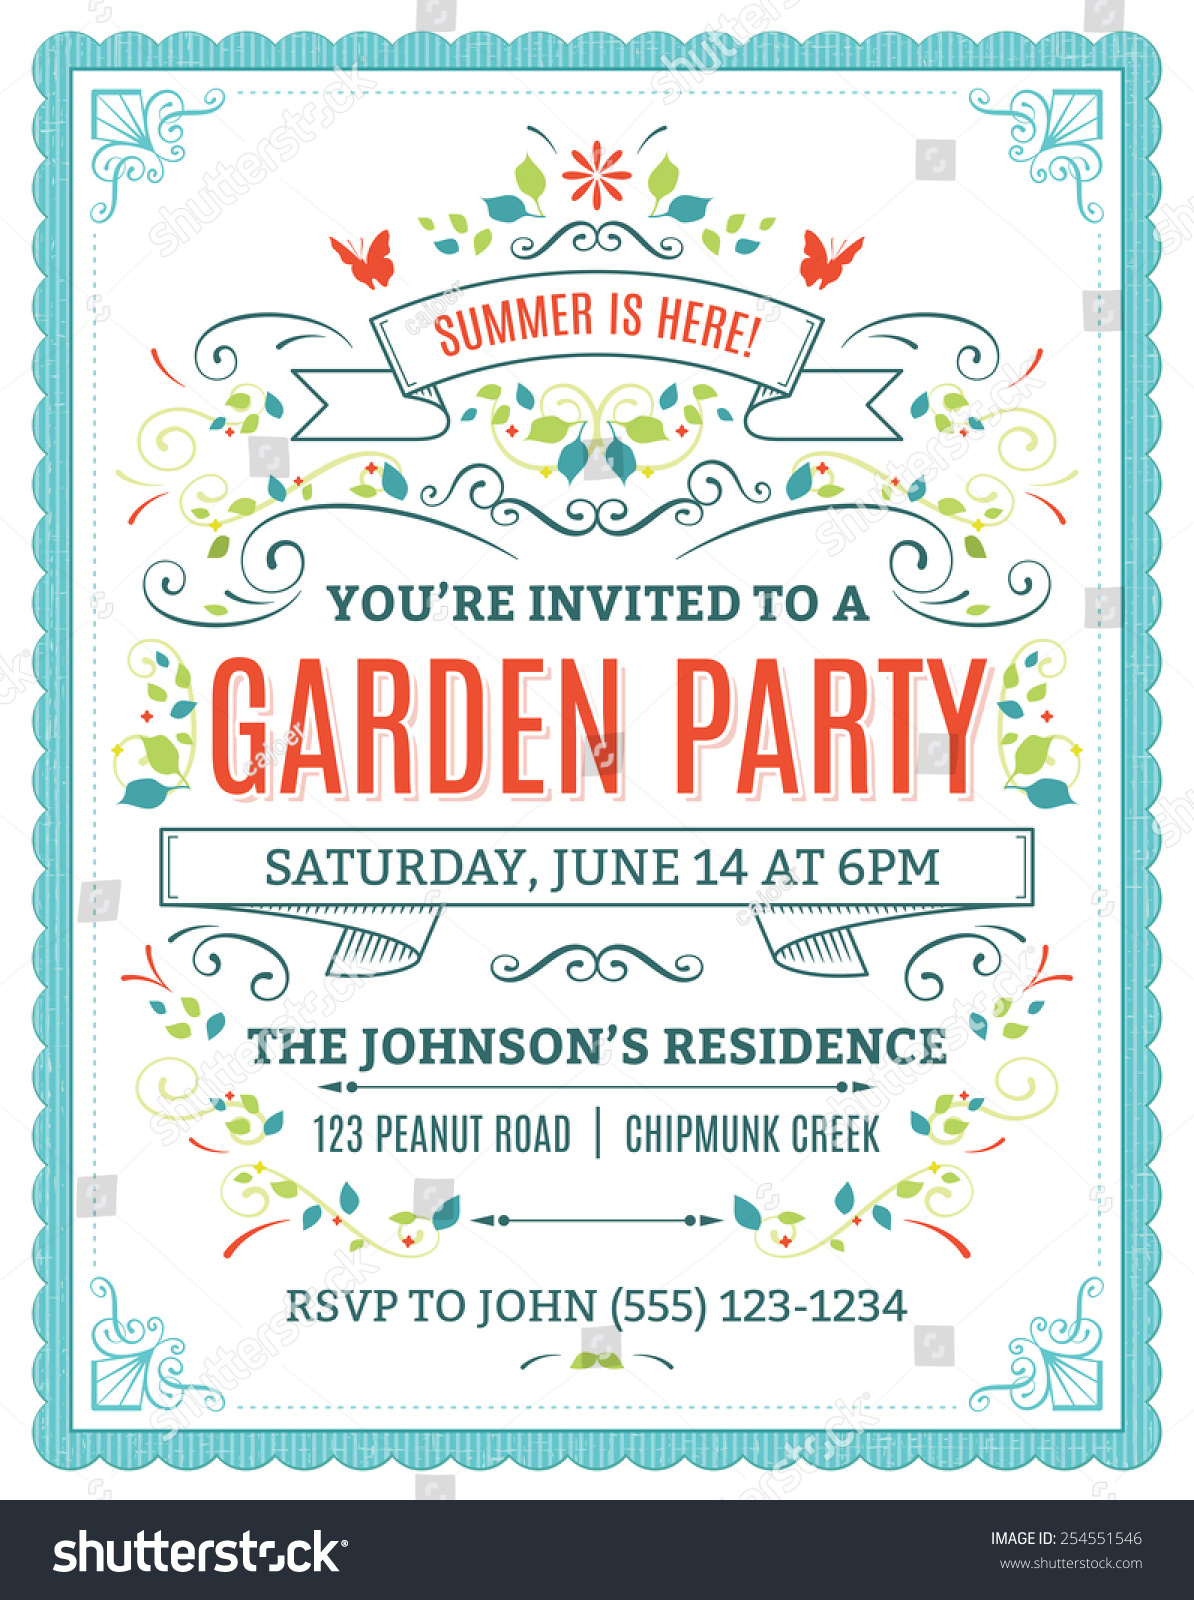 Vector Garden Party Invitation Ornaments Ribbons Stock Vector